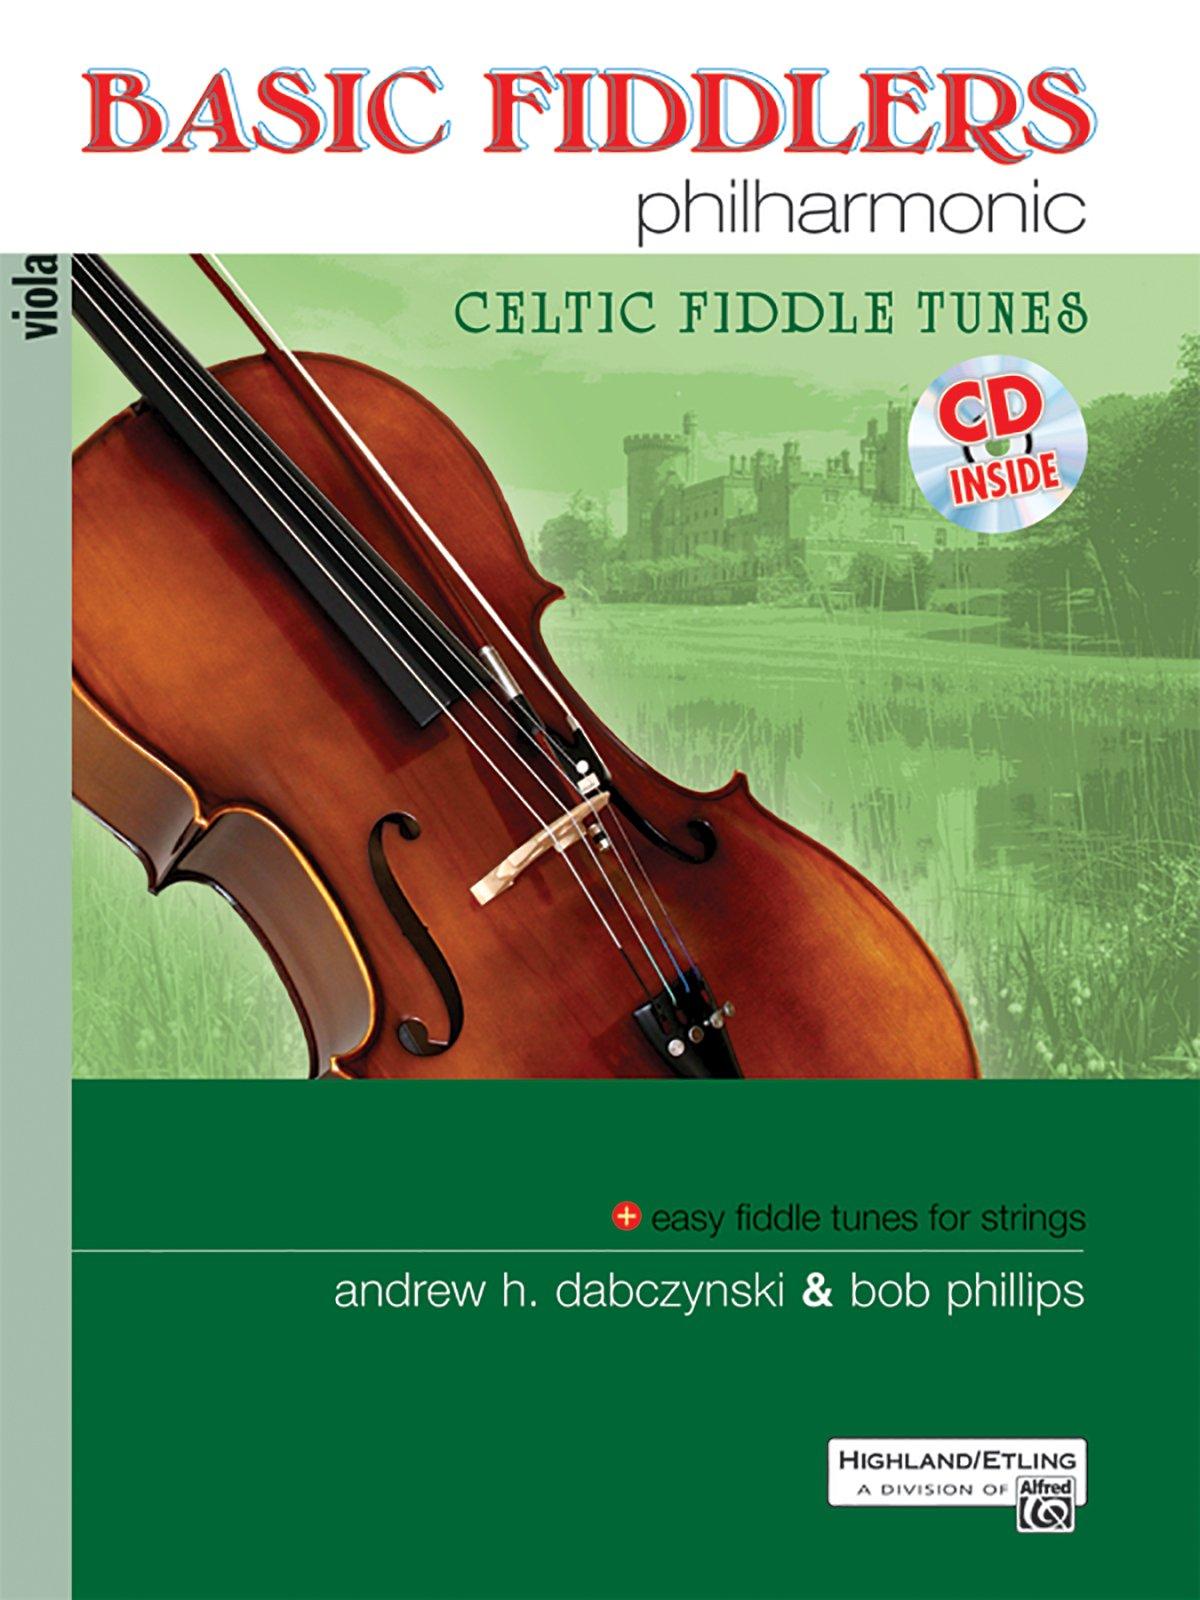 Basic Fiddlers Philharmonic Celtic Fiddle Tunes: Viola, Book & CD (Philharmonic Series) ebook